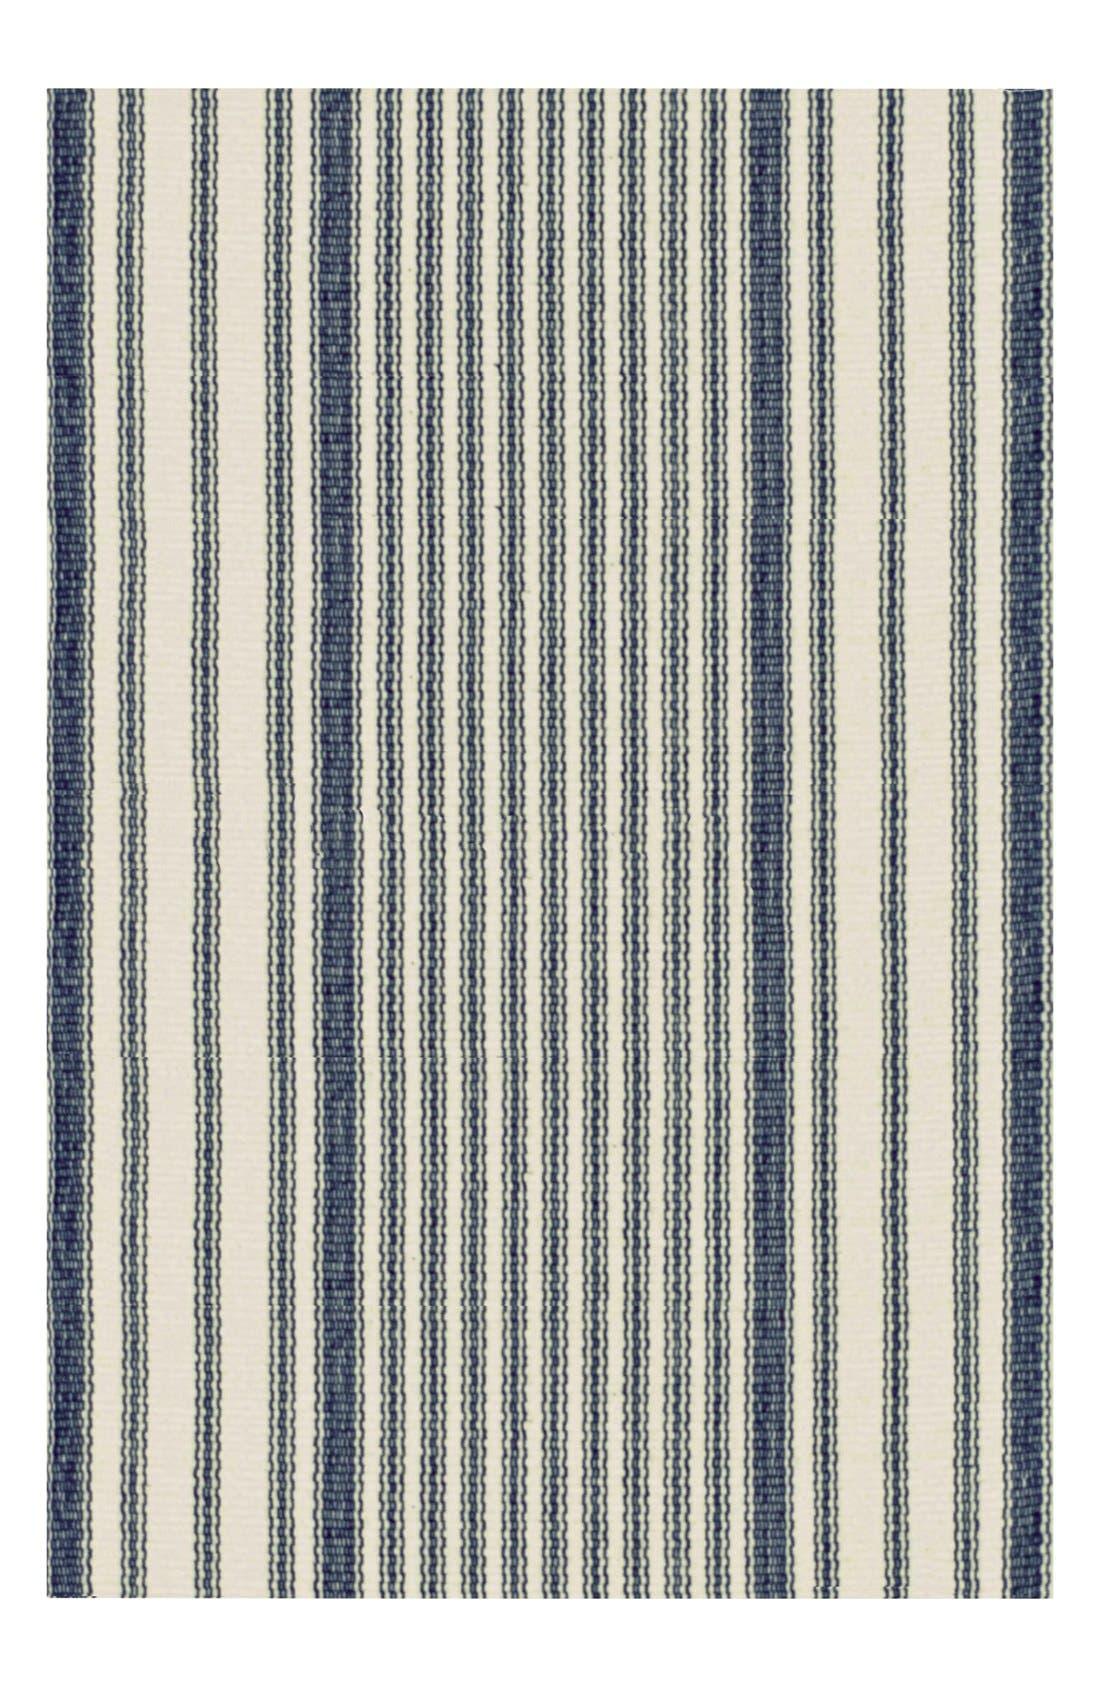 Stripe Ticking Rug,                         Main,                         color, BLUE/ MULTI